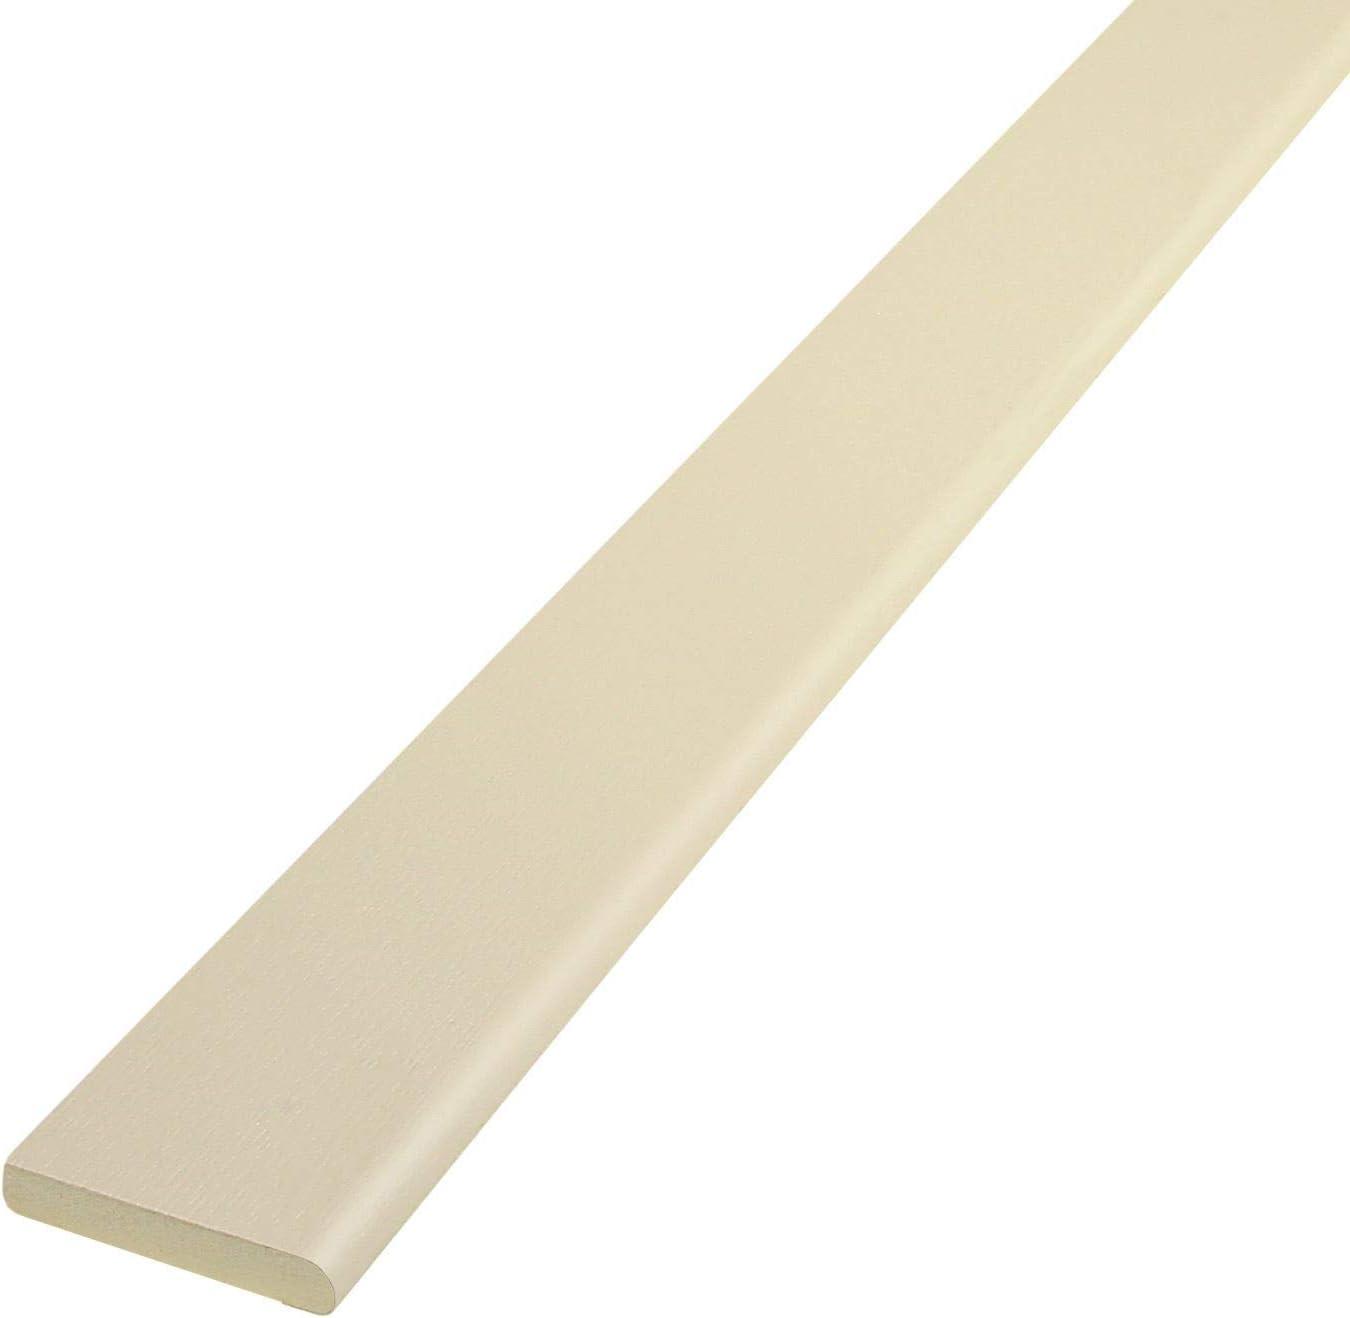 White Ash 95mm x 5m Pencil-Round Architrave uPVC Plastic Window Finishing Trim